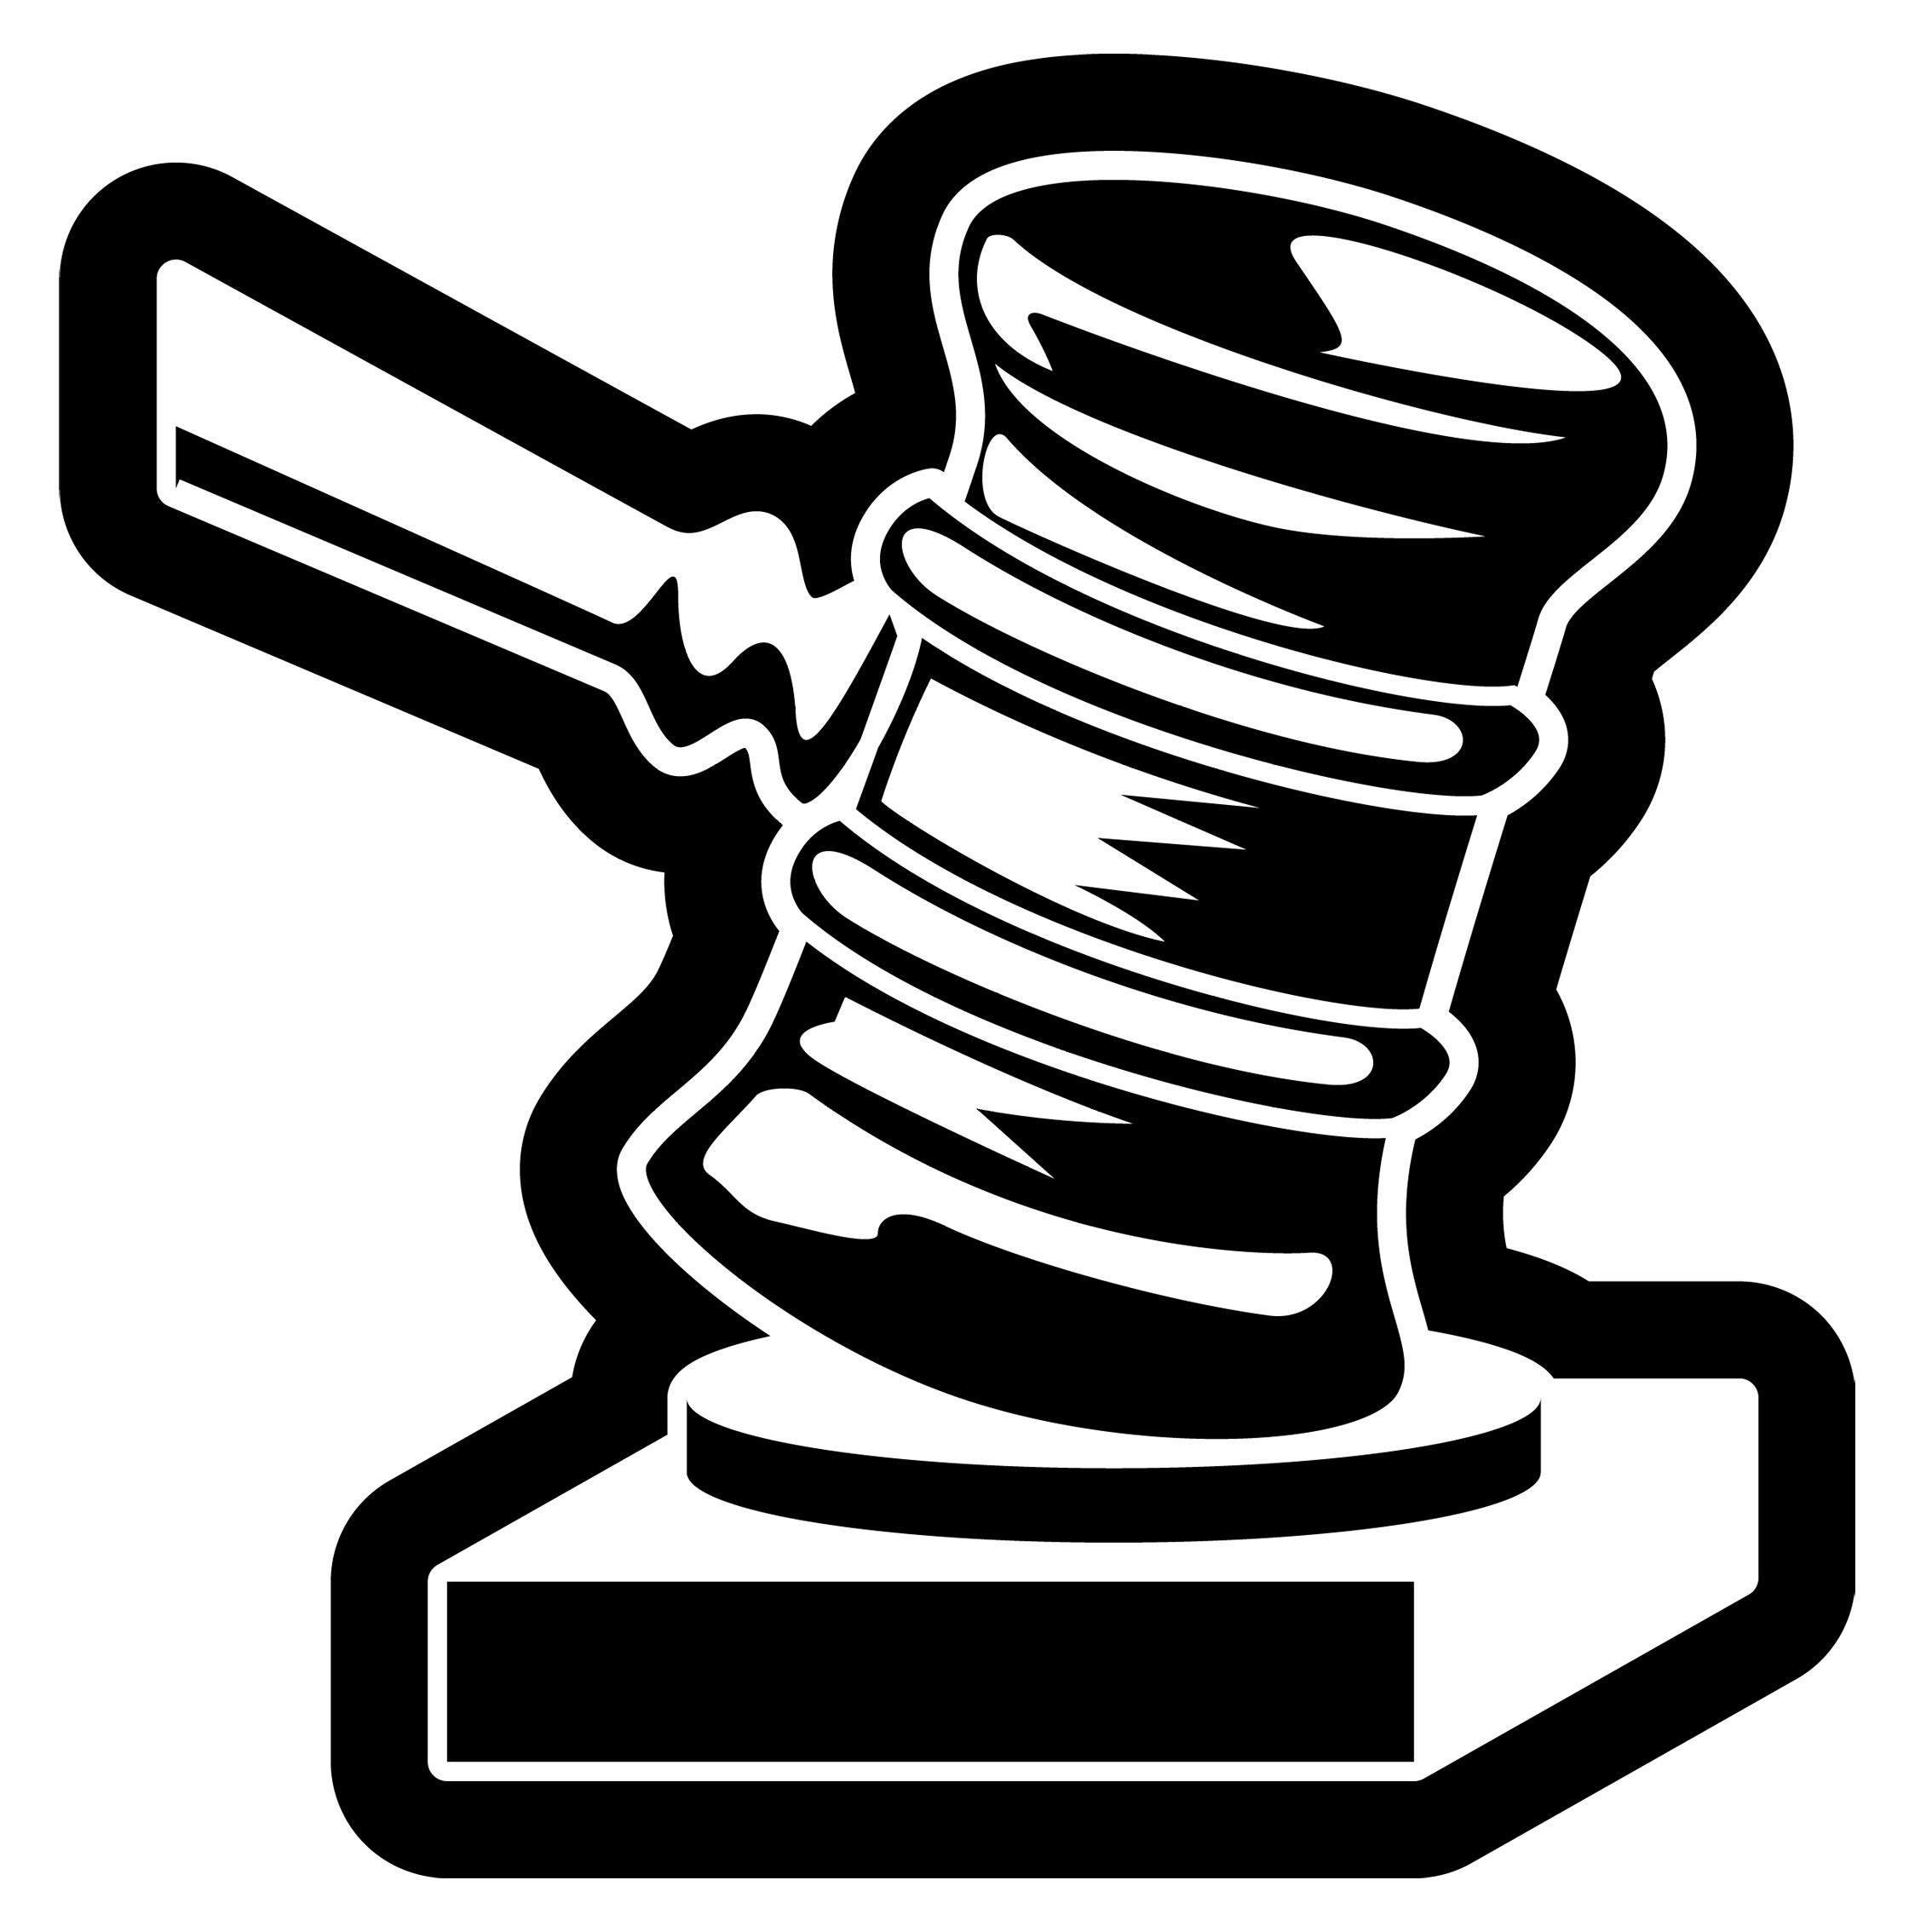 Legal employment law clipart 3 image